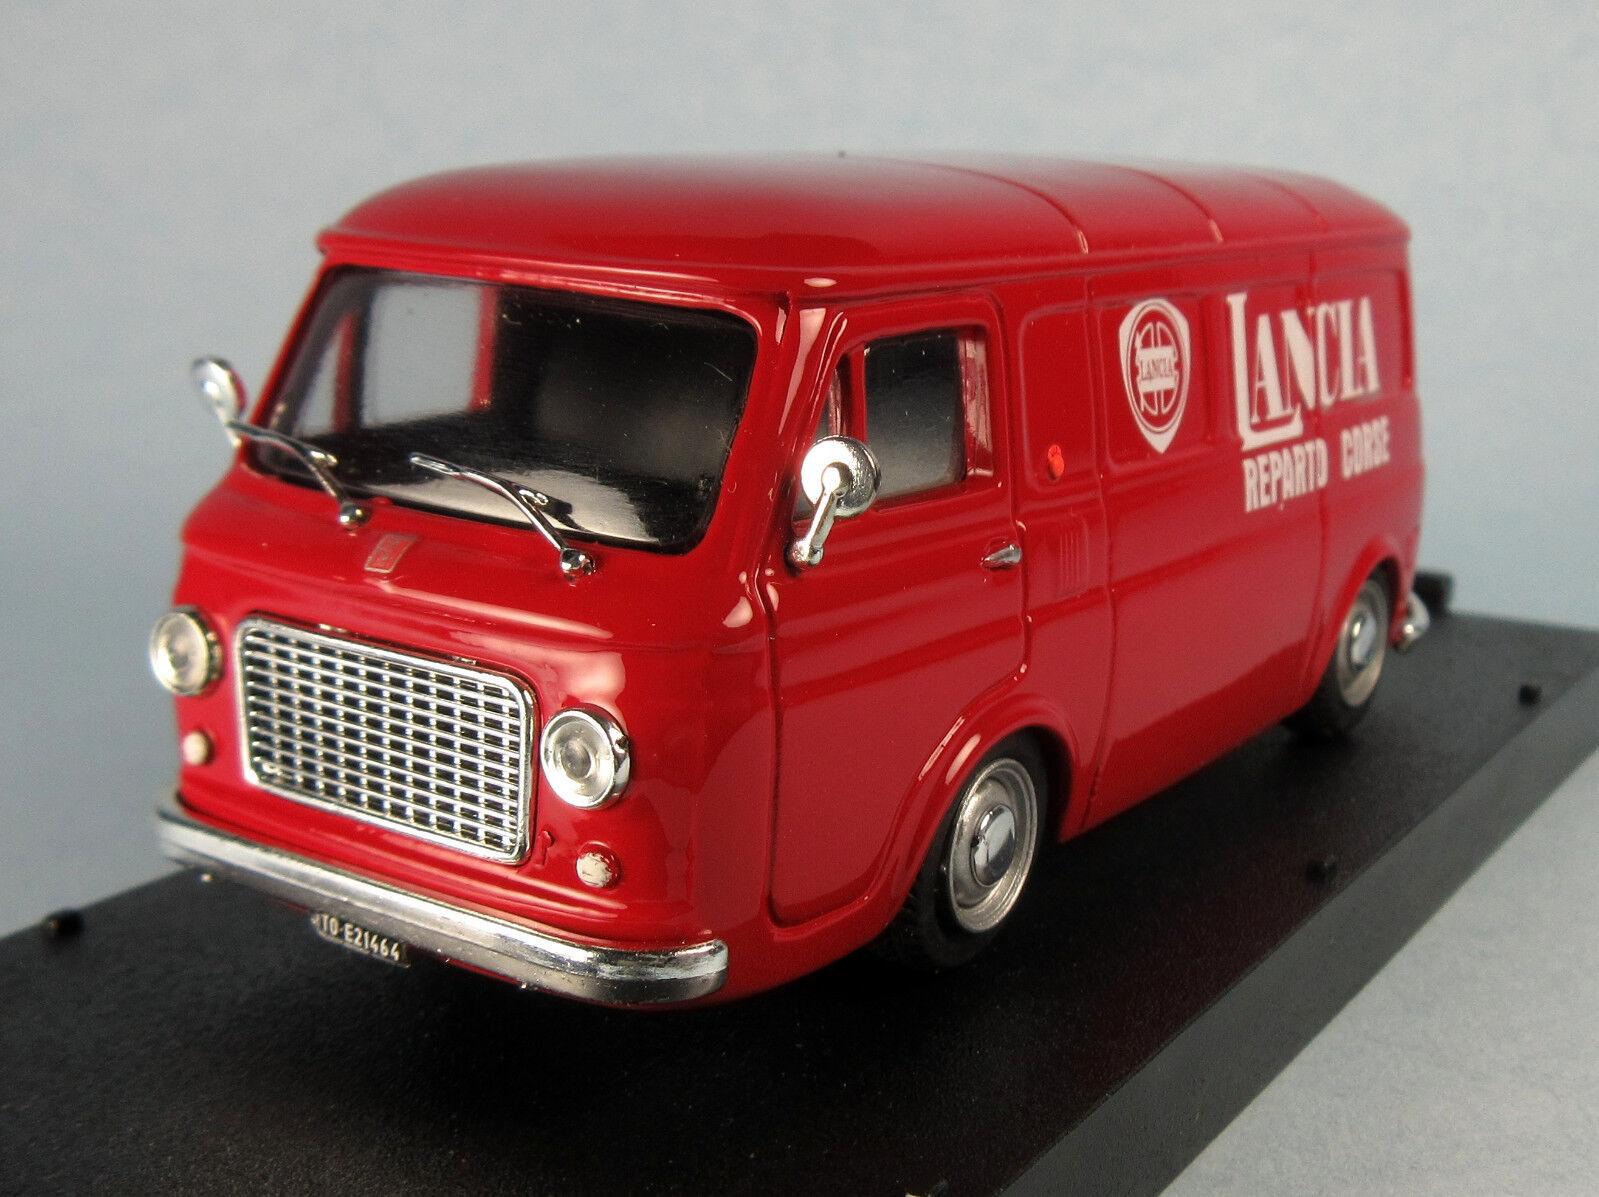 PROGETTO K Fiat 238 Lancia Racing Van (rojo)  Scale Diecast Model NEW, RARE